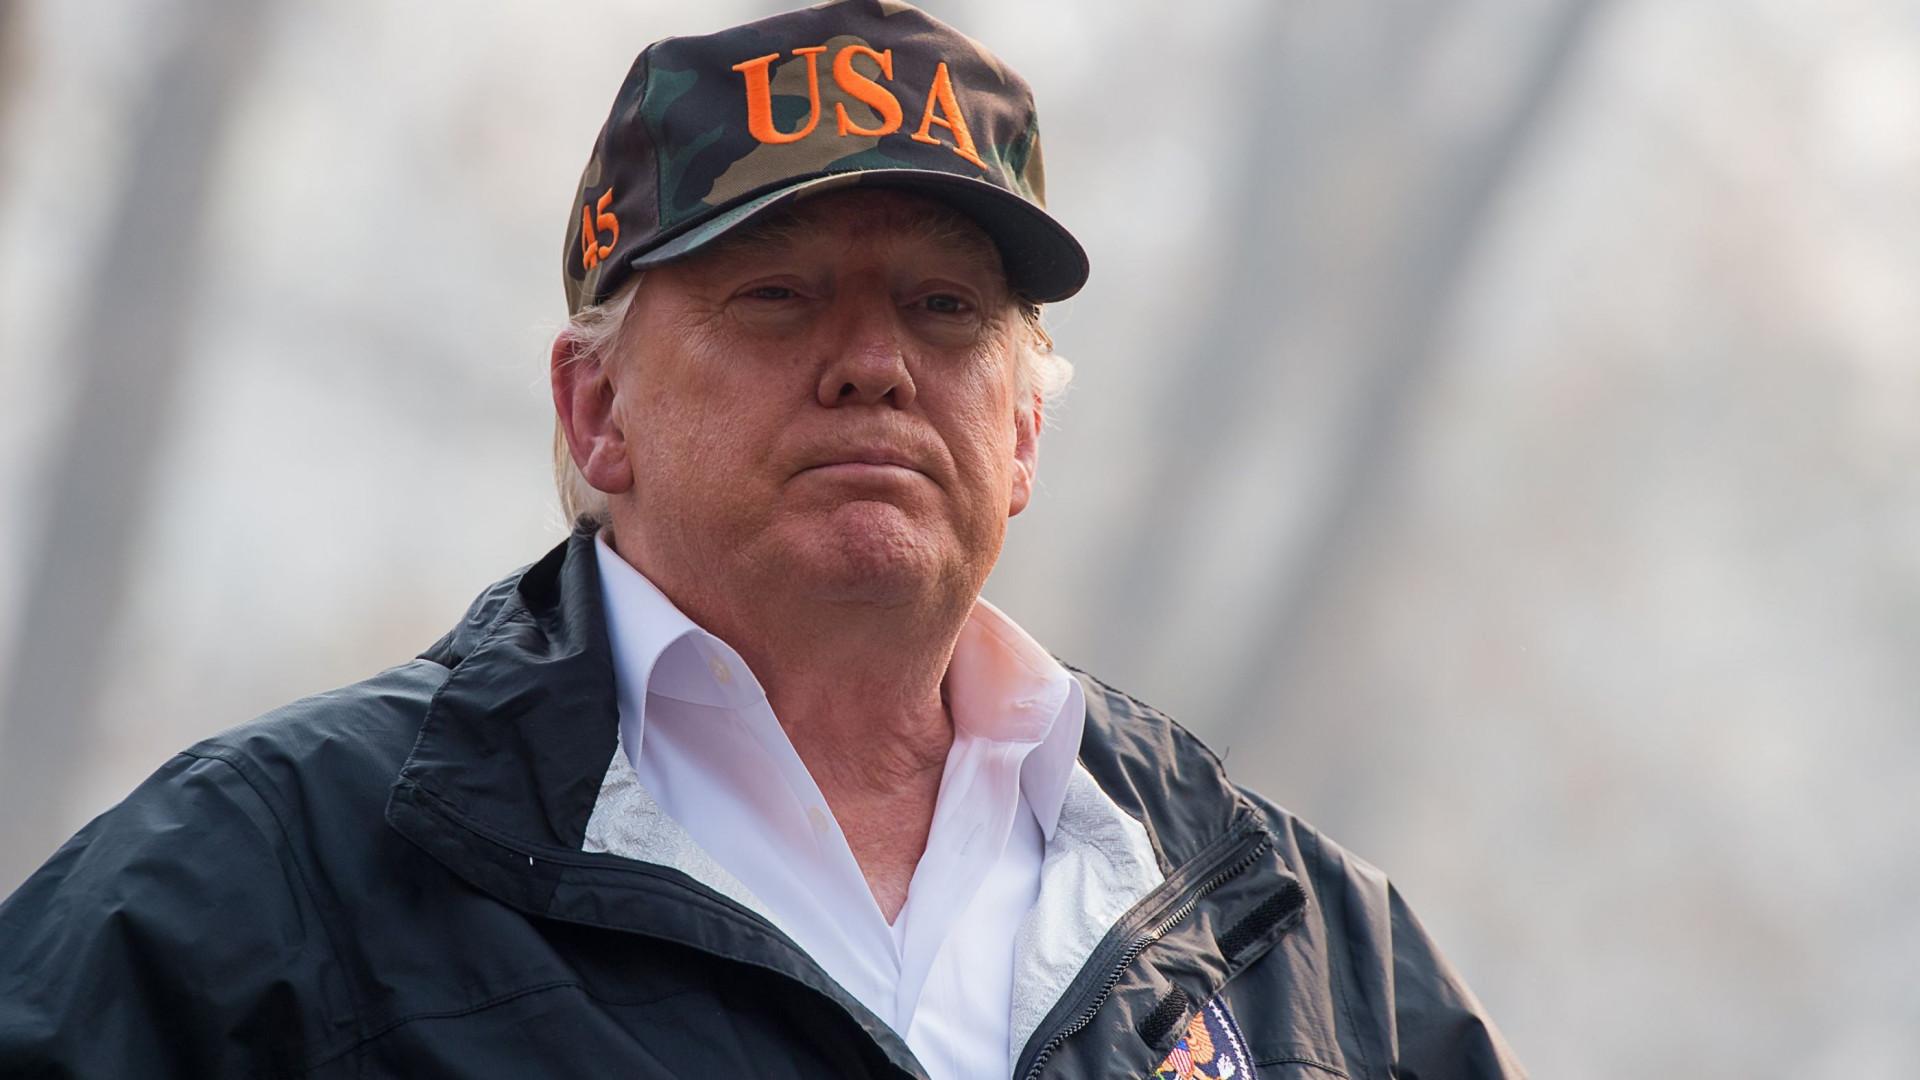 Trump deu o exemplo das florestas finladesas. Agora é alvo de piadas